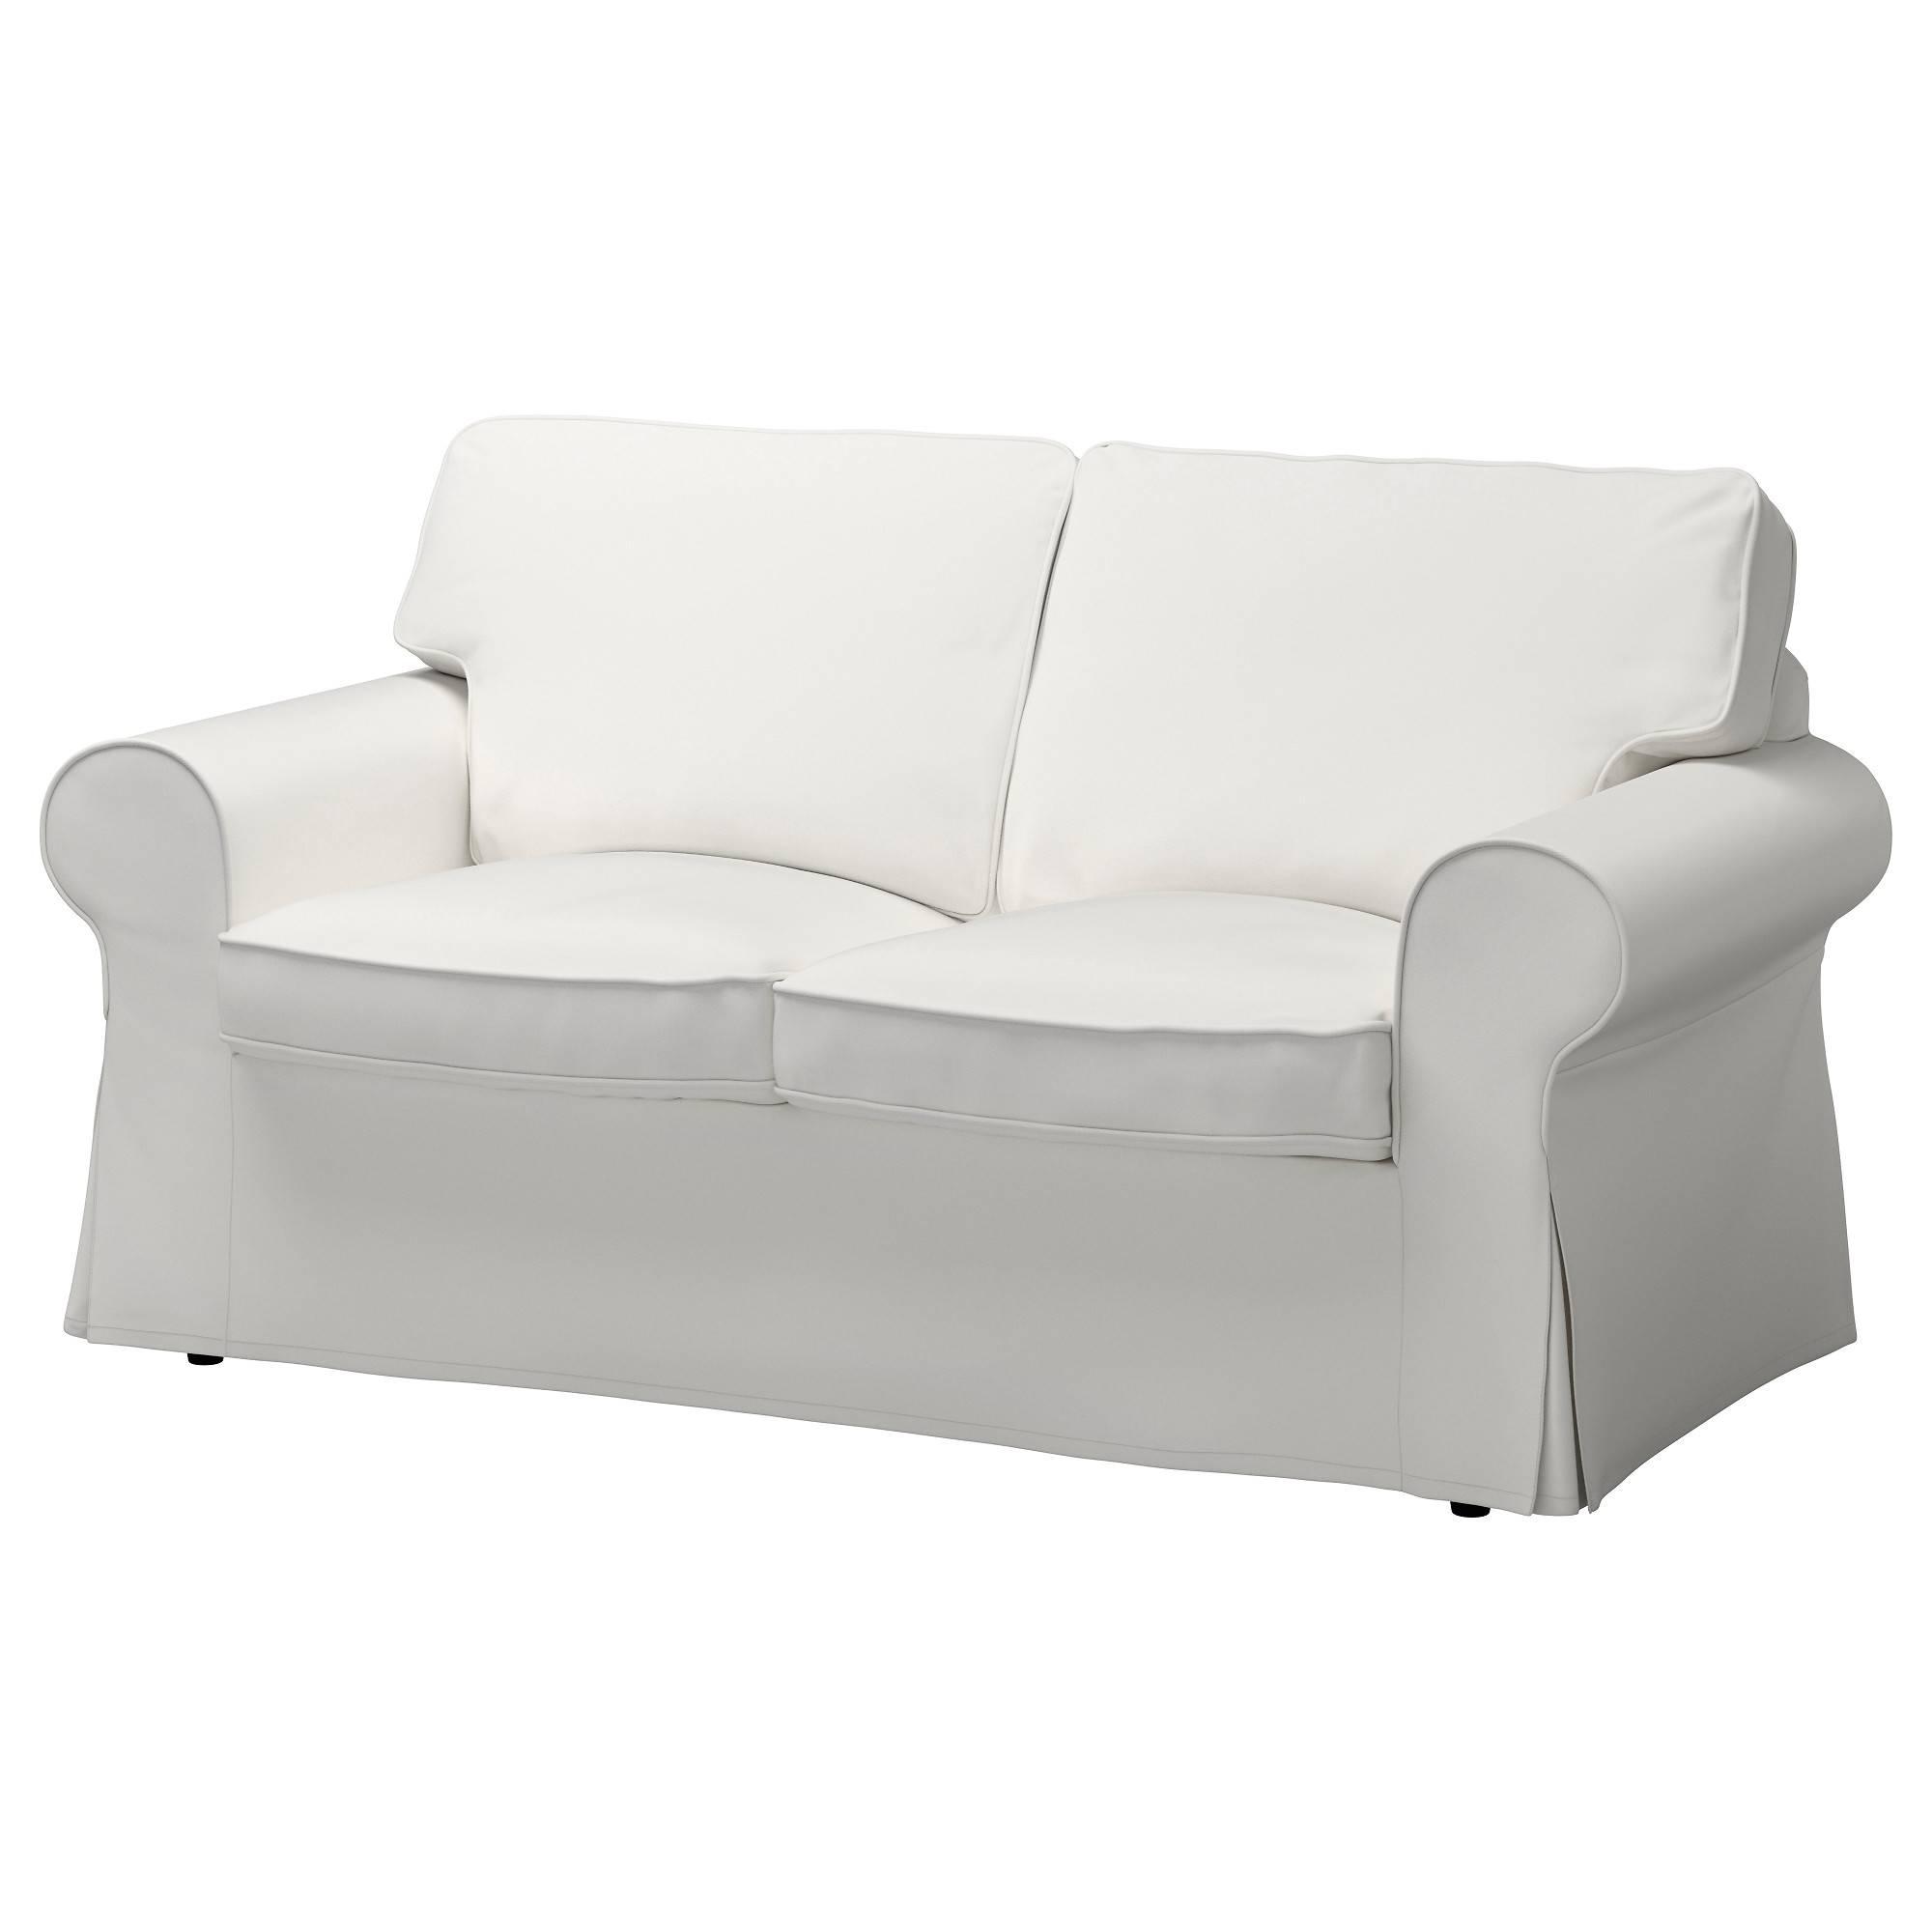 Ektorp Loveseat Cover - Nordvalla Dark Beige - Ikea throughout Black And White Sofas (Image 12 of 30)